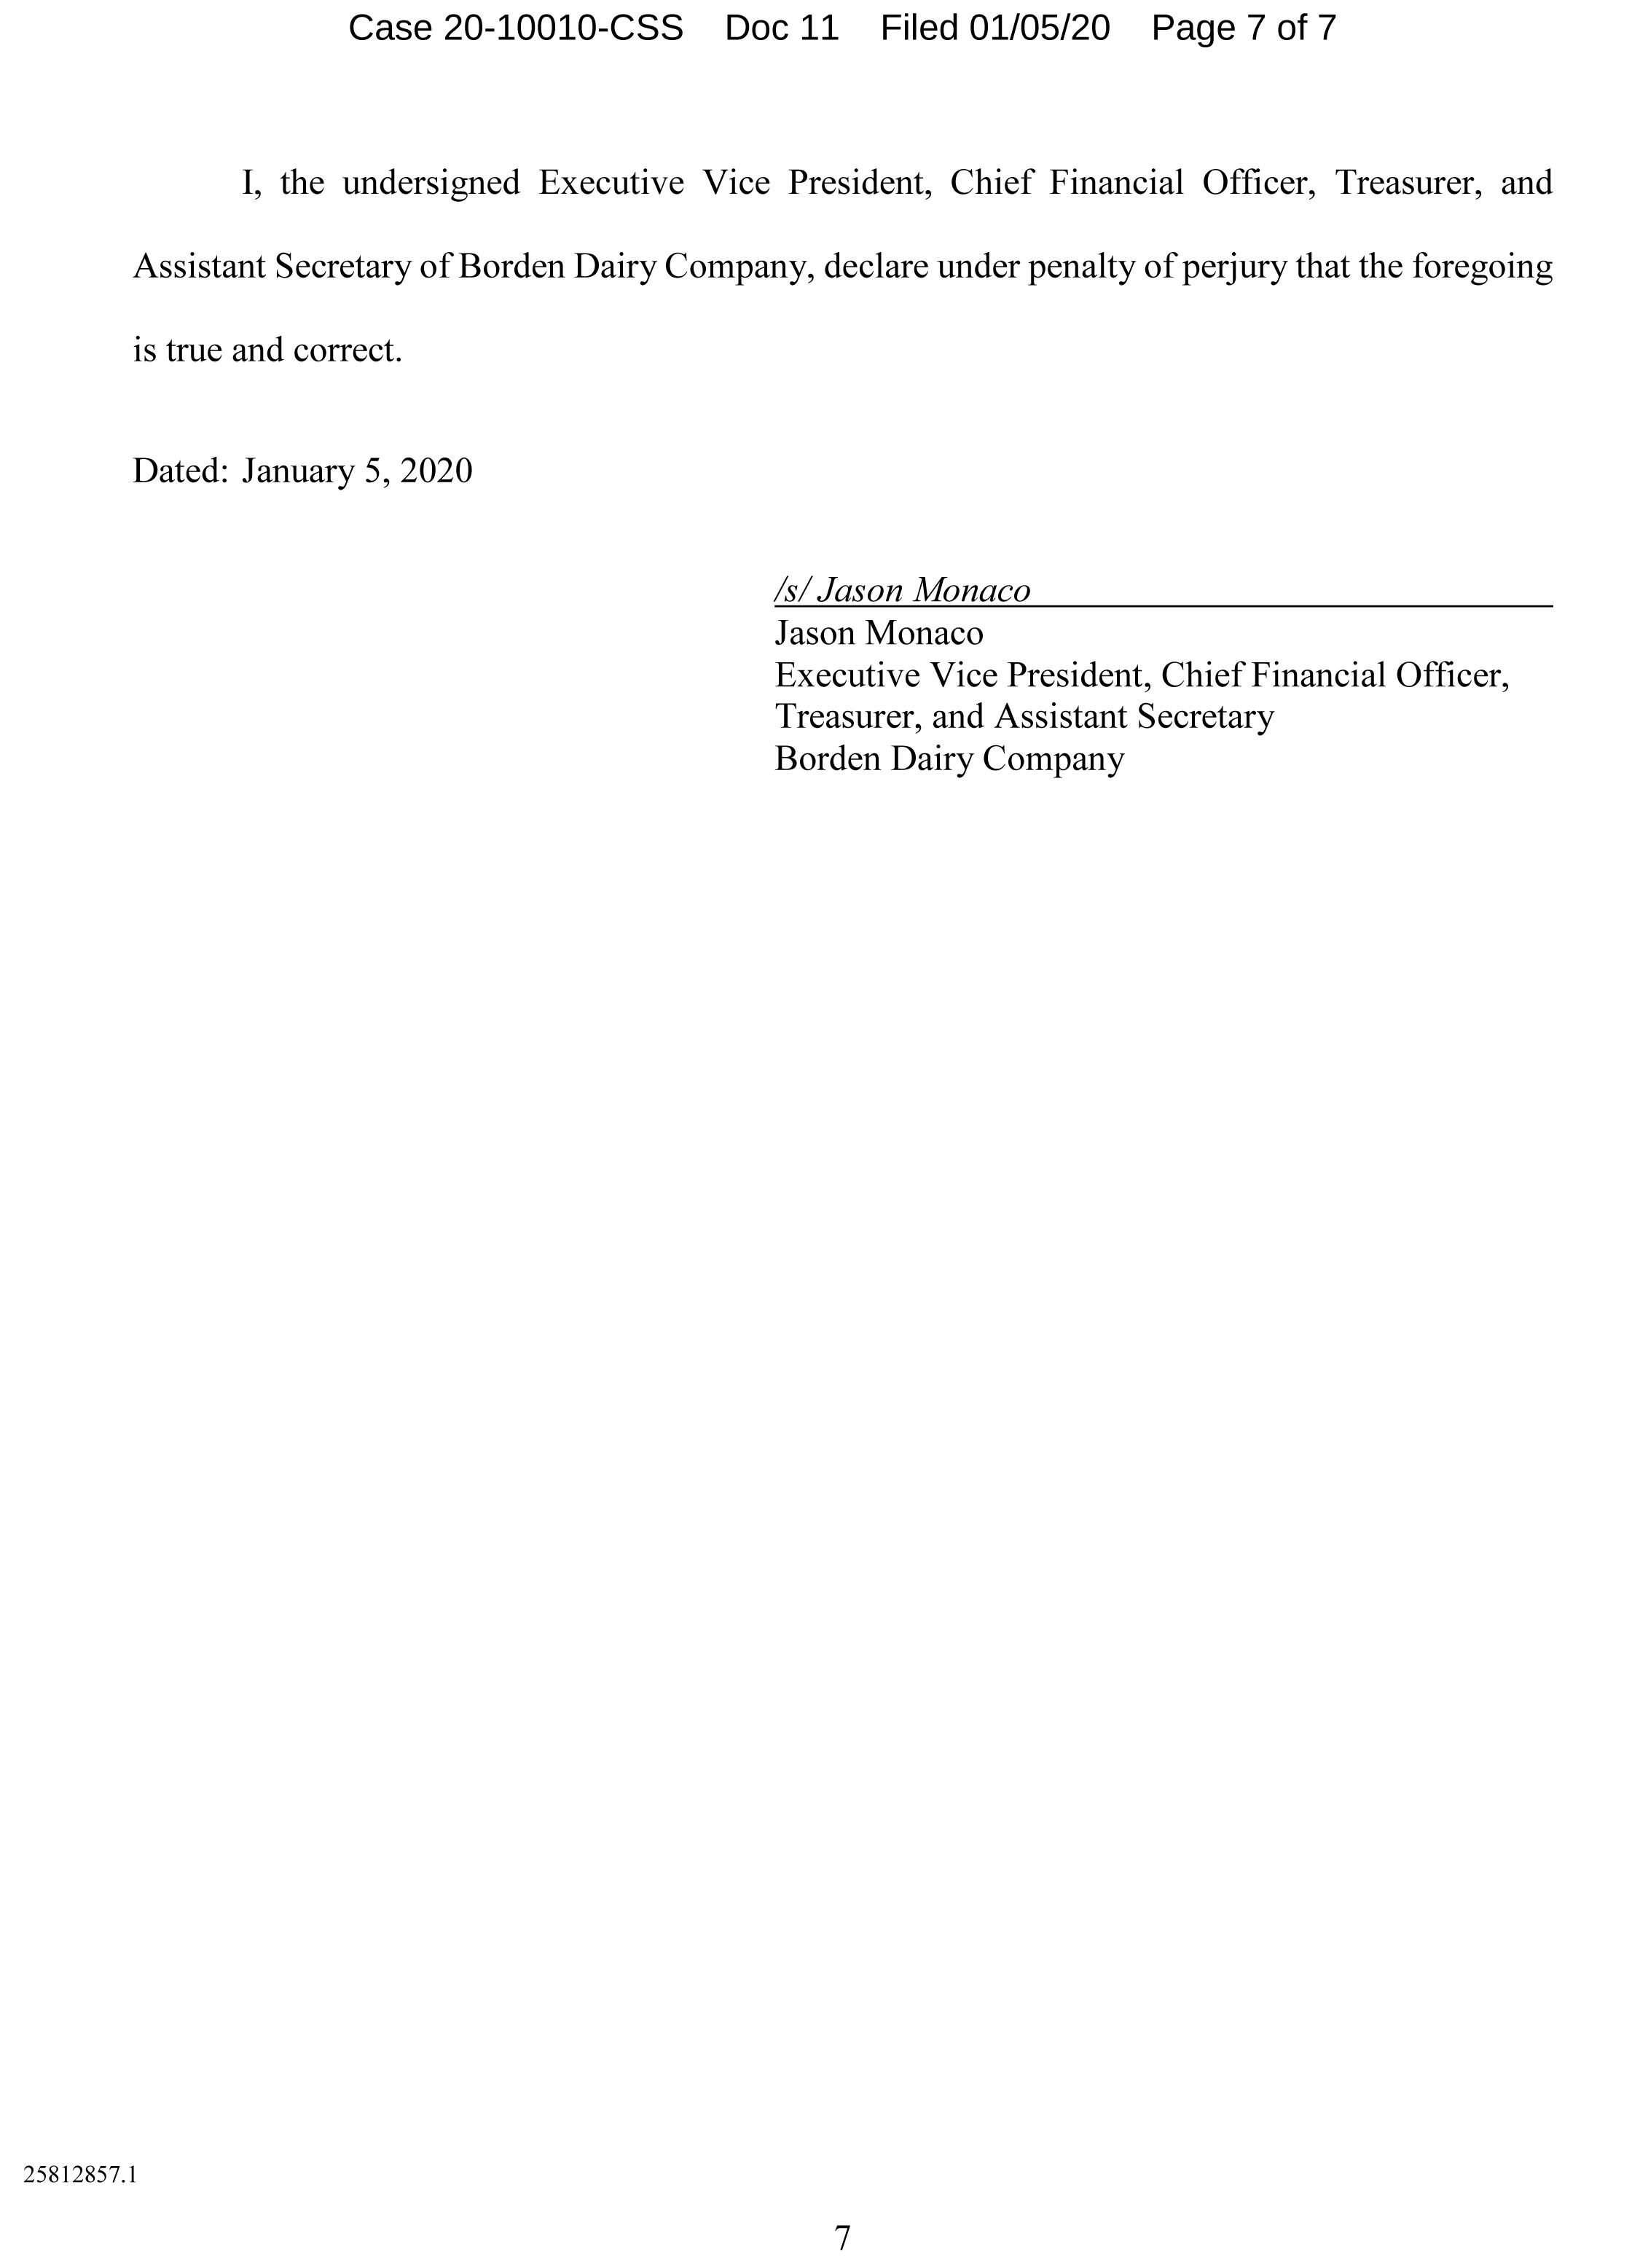 Microsoft Word - 25812857_1.docx